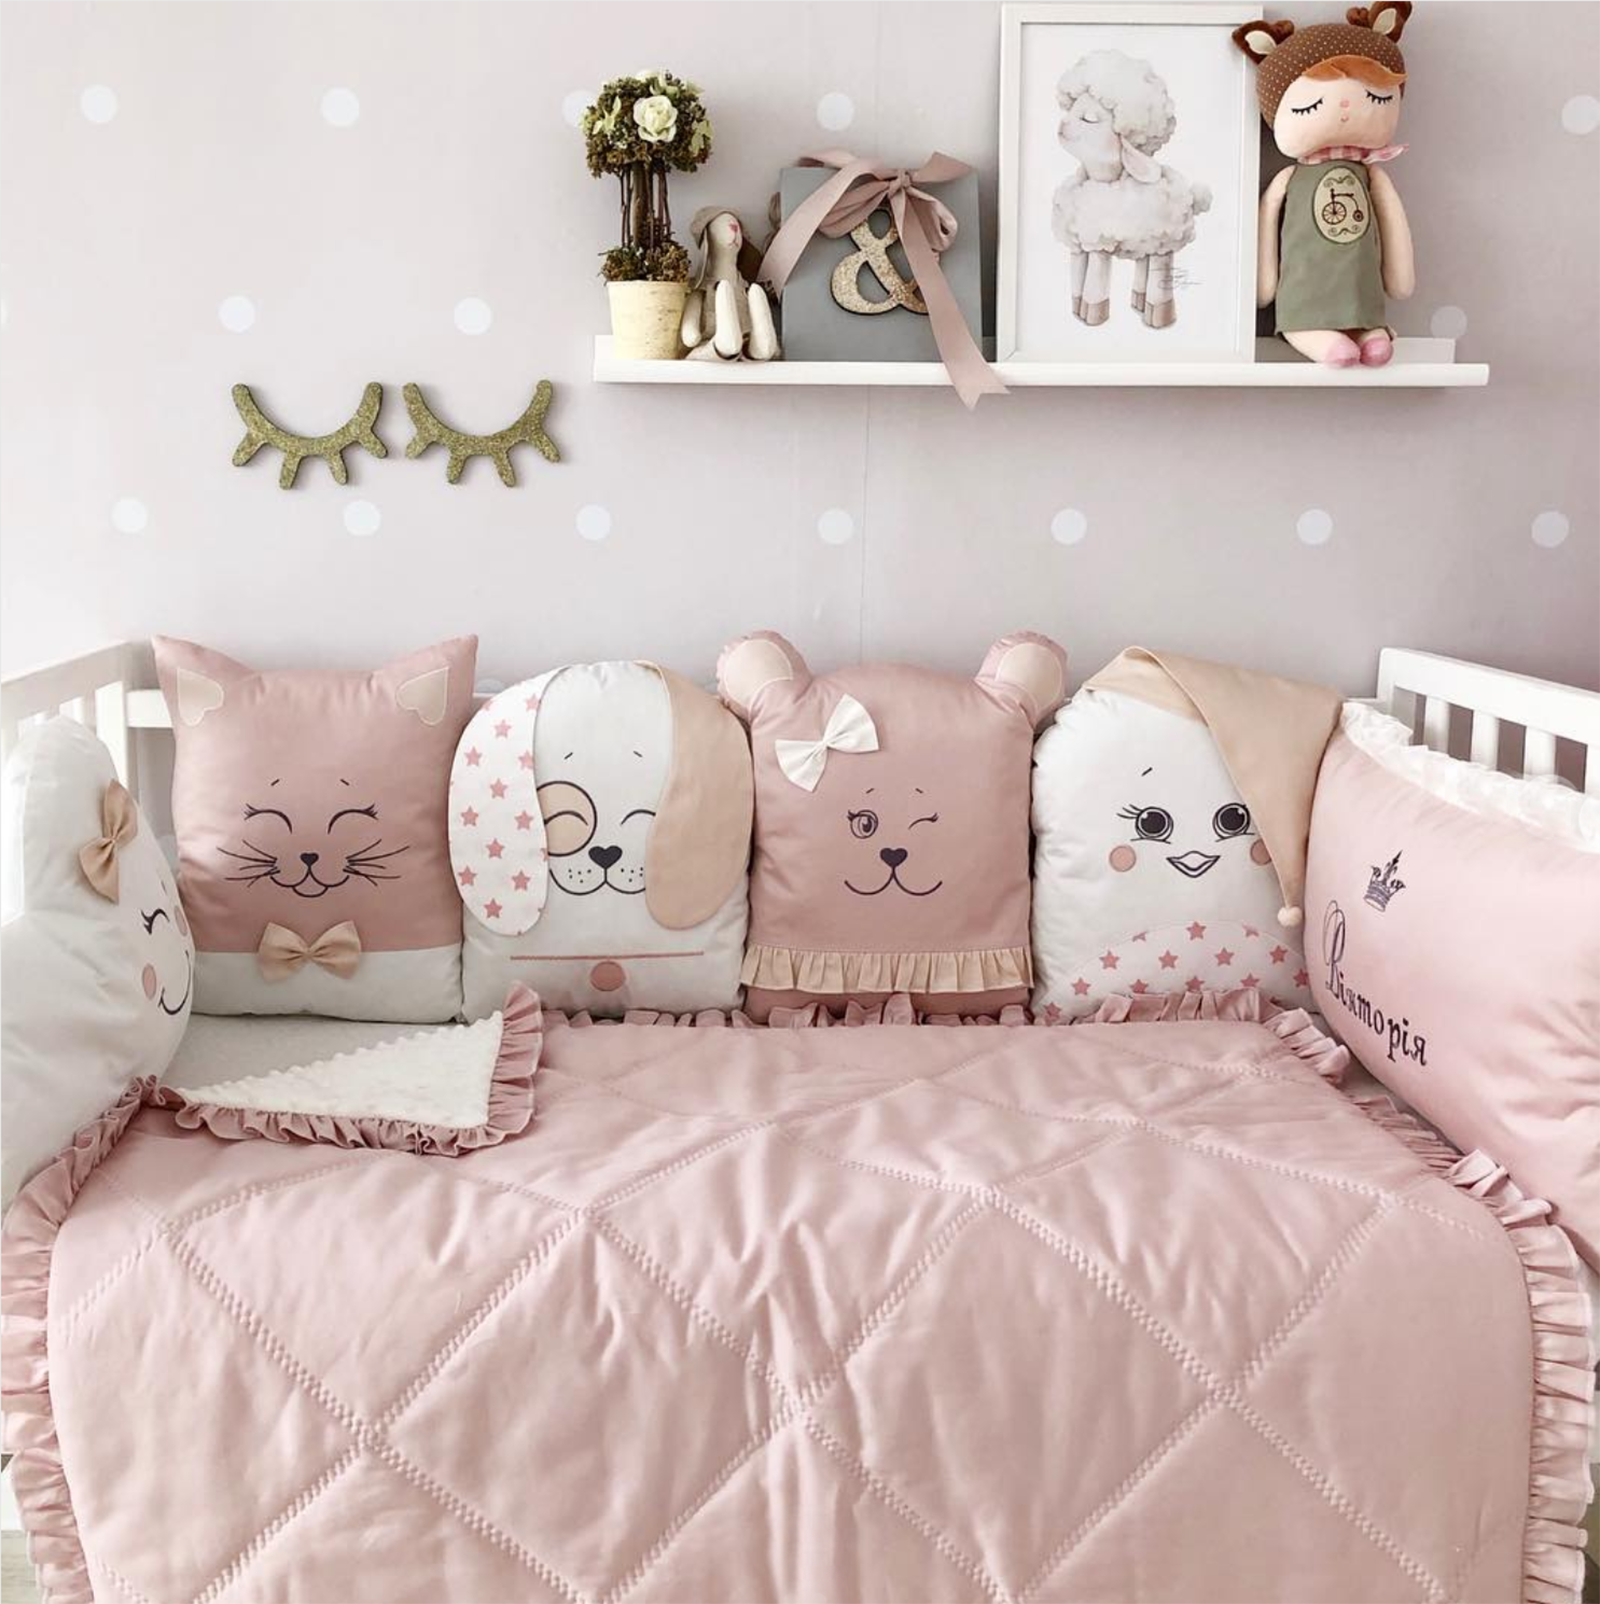 Baby Crib Set For Girl Crib Bumper Pillow Set Crib Baby Blanket